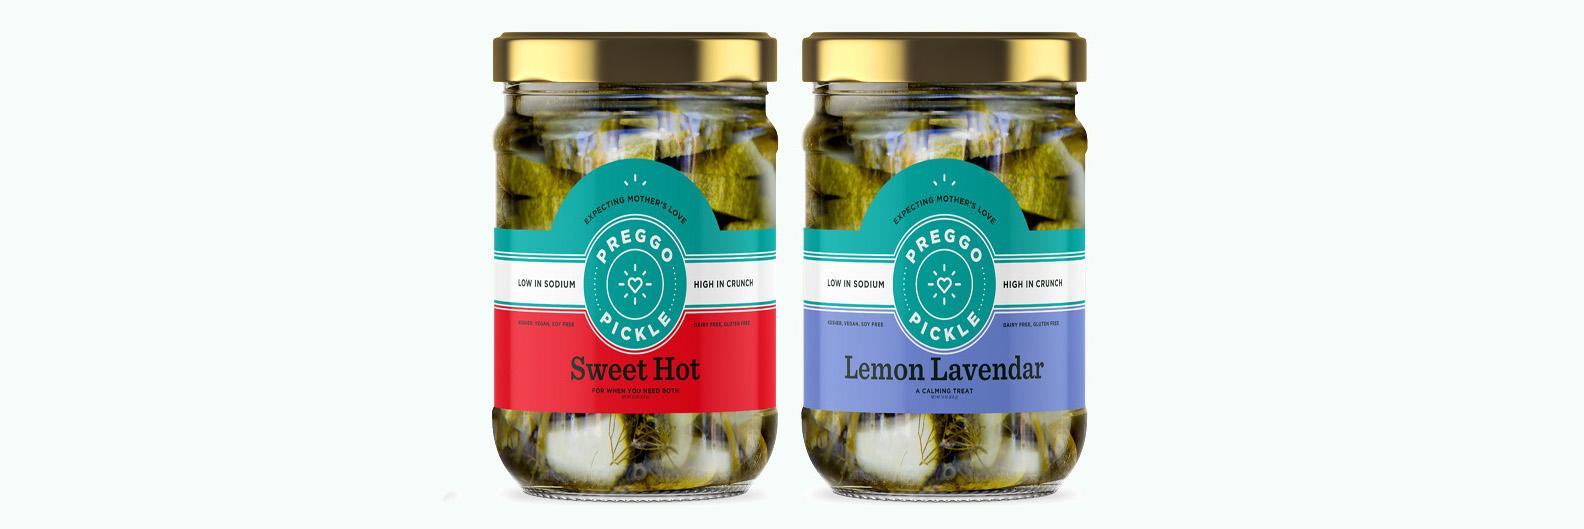 Preggo Pickle Mix and Match 2 Pack